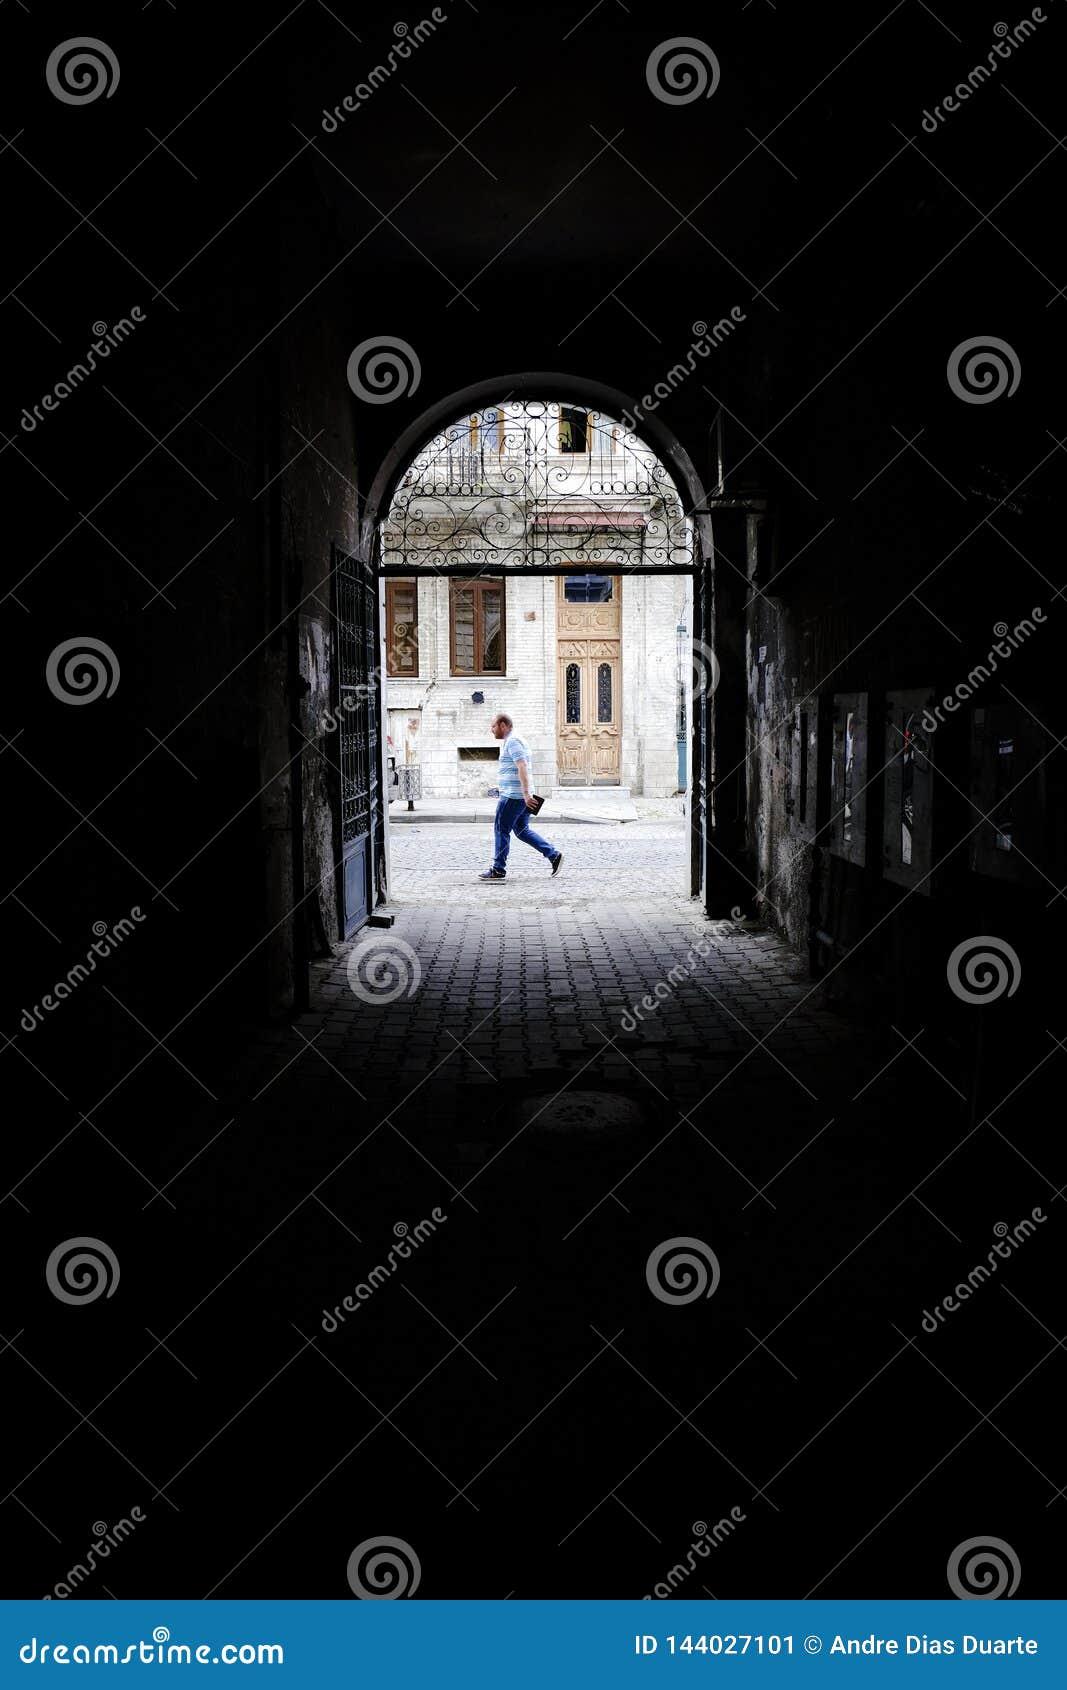 Gang aan straat met persoon die voorbijgaat